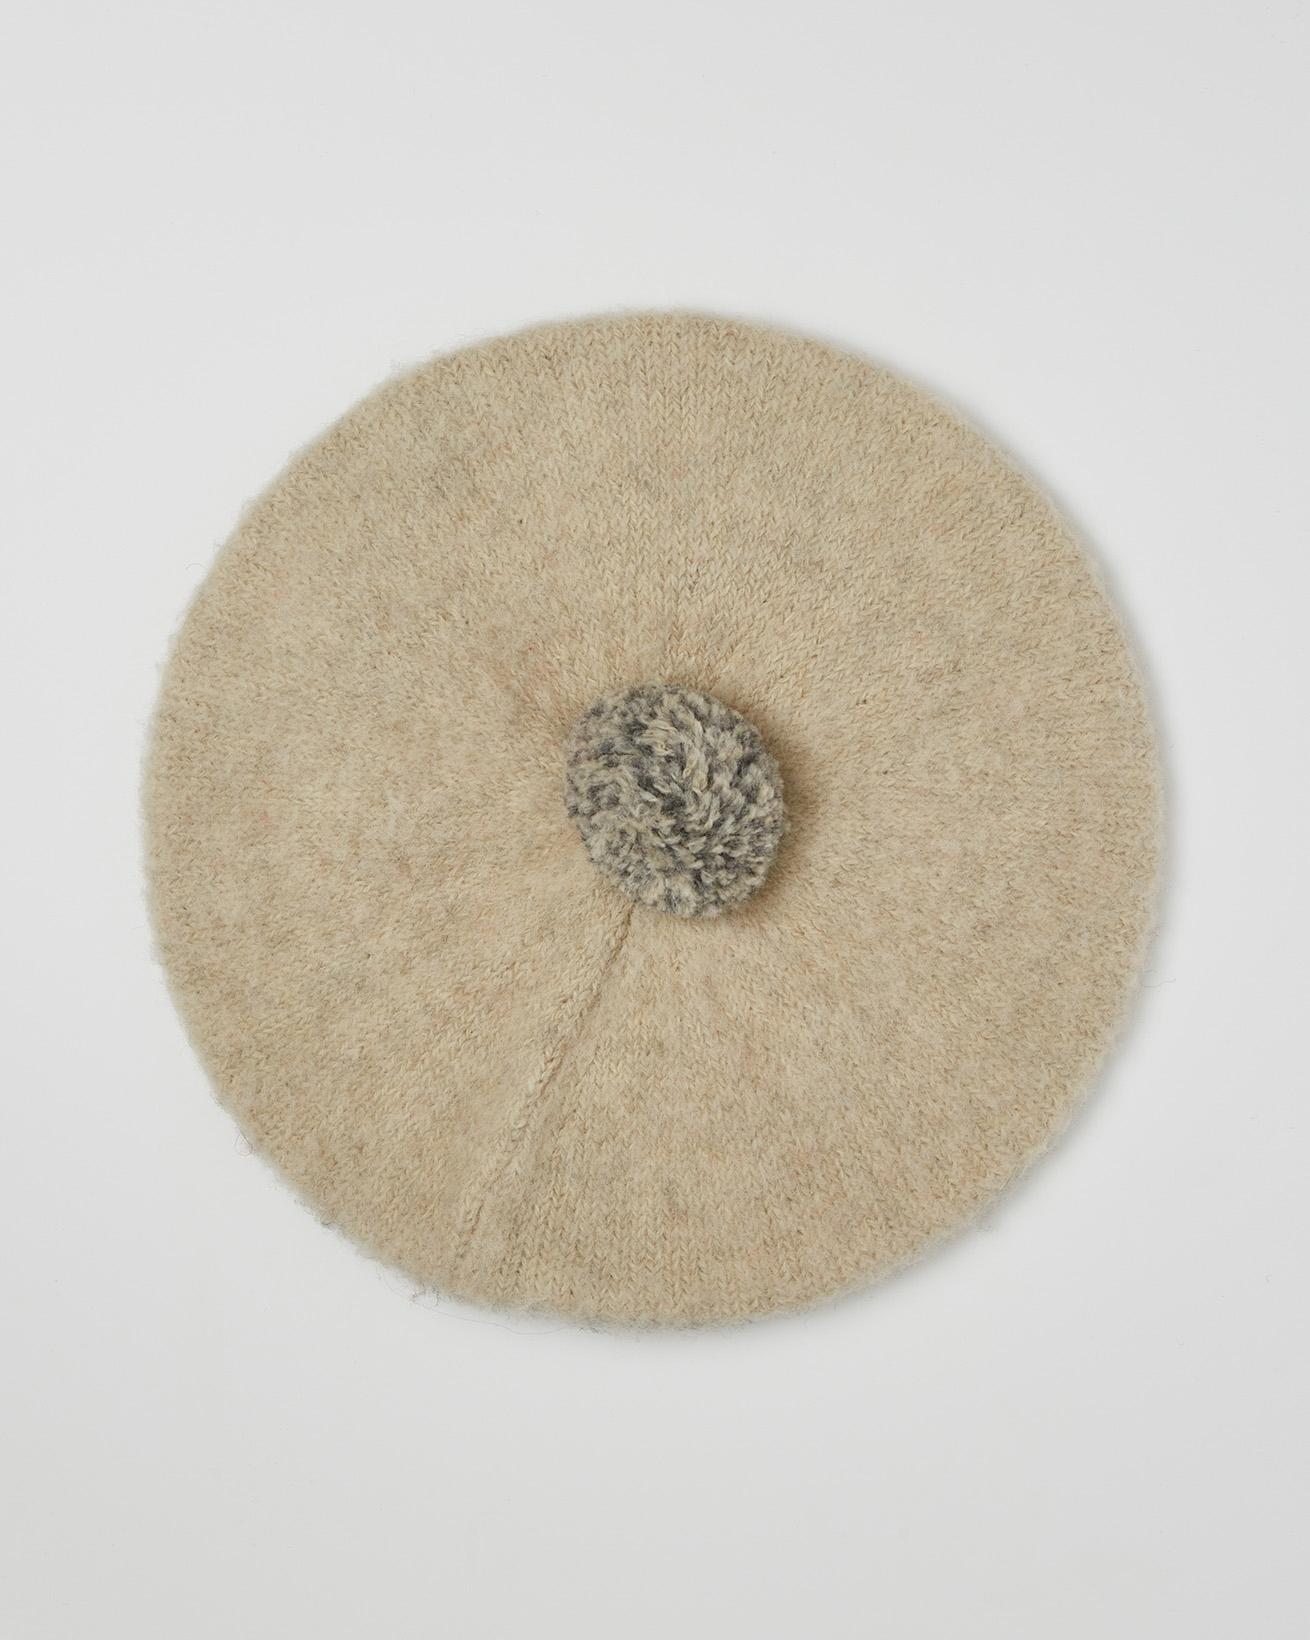 Shetland Wool Pom Pom Beret - Oatmeal Colourblock - One Size - 2589